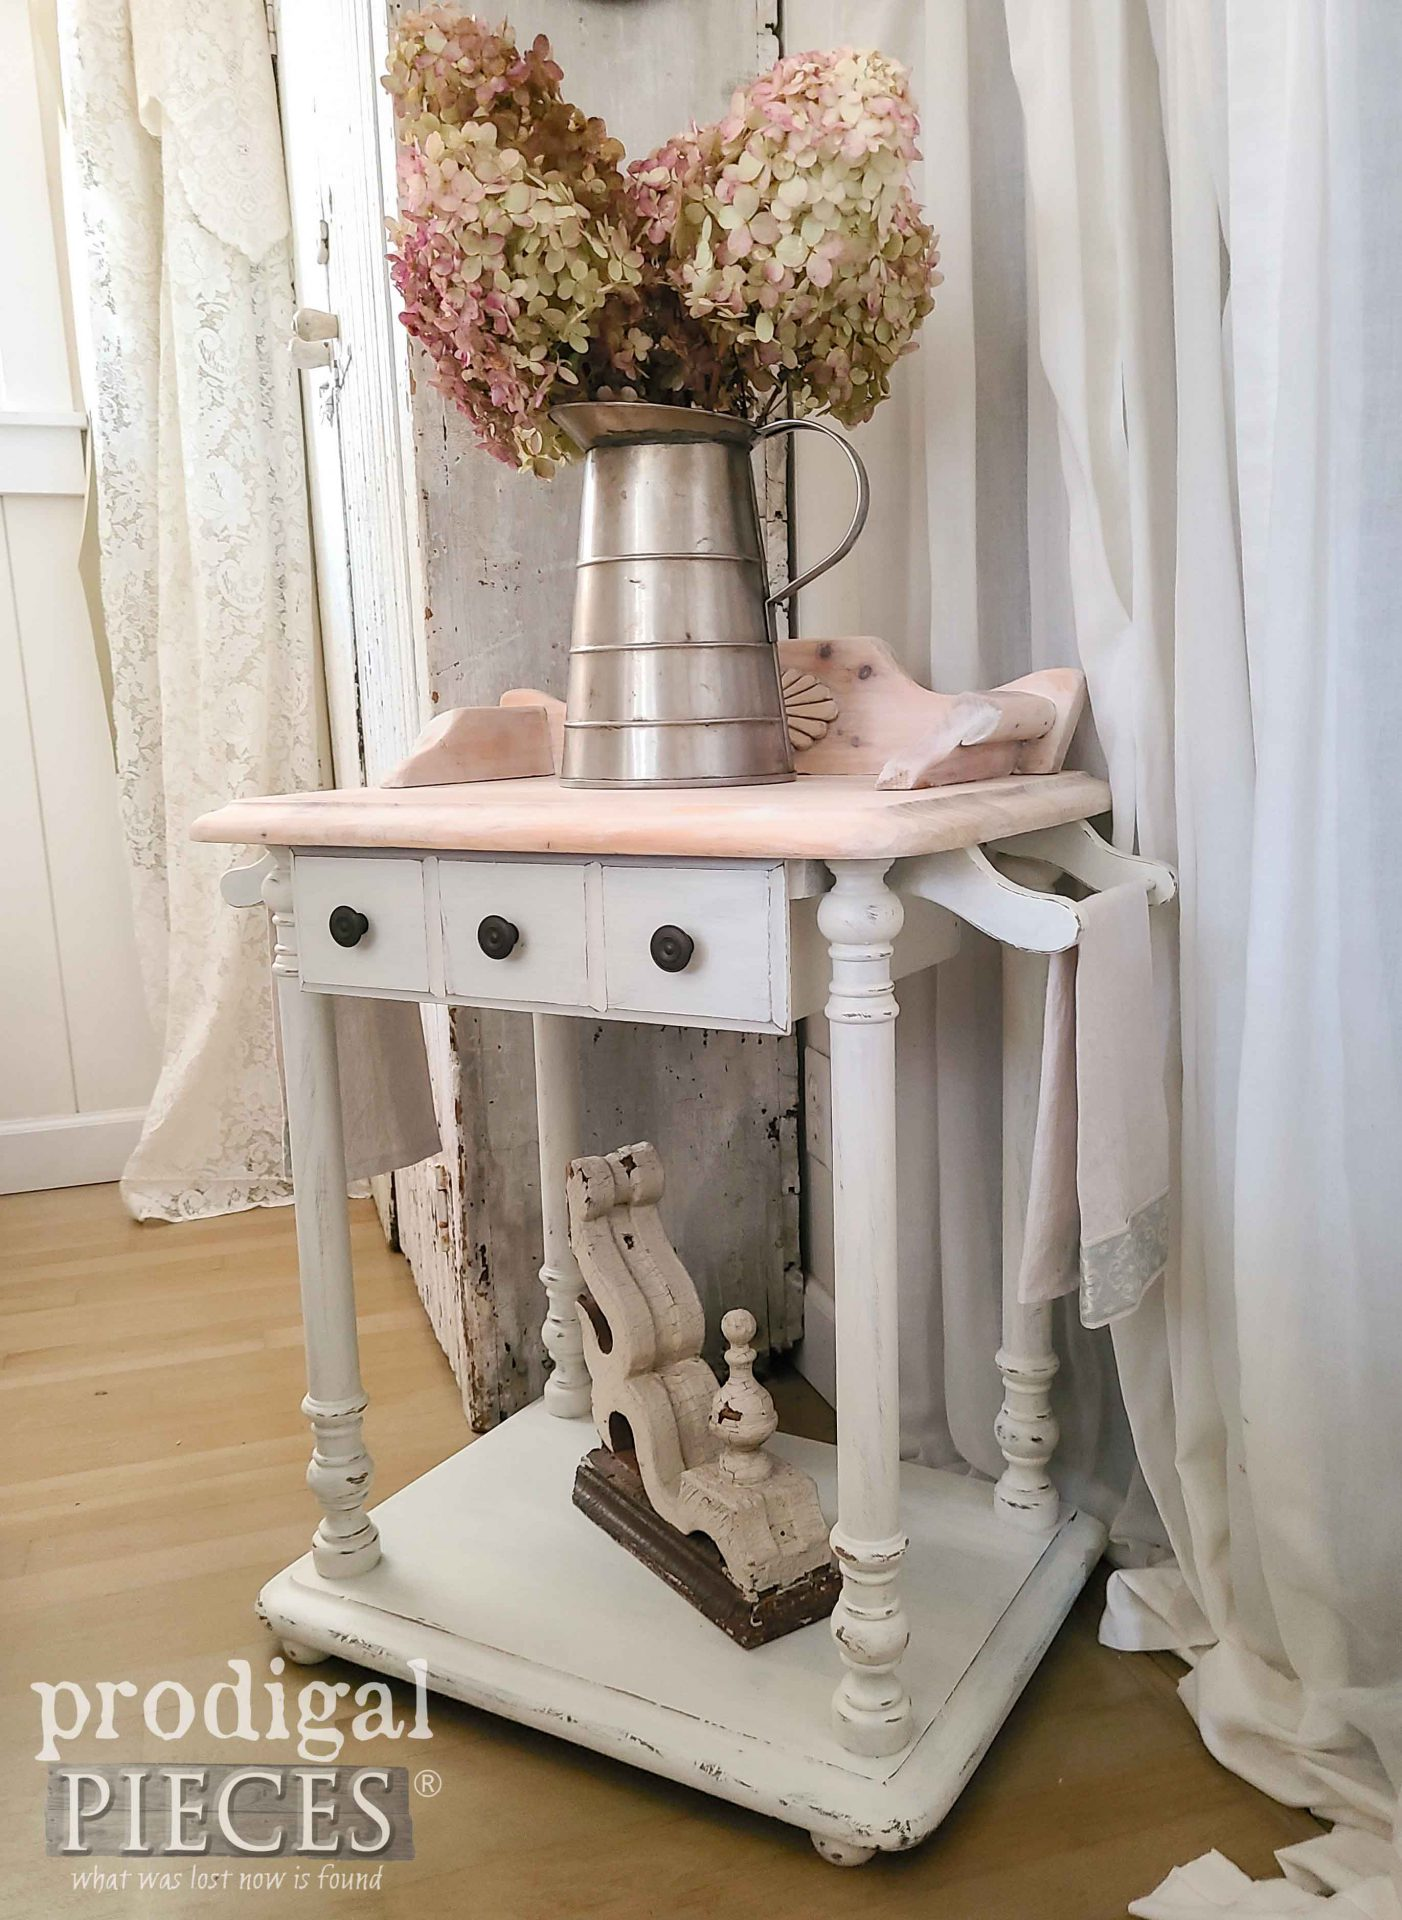 Antique White Wash Stand with Linen Towels by Larissa of Prodigal Pieces | prodigalpieces.com #prodigalpieces #antique #farmhouse #furniture #home